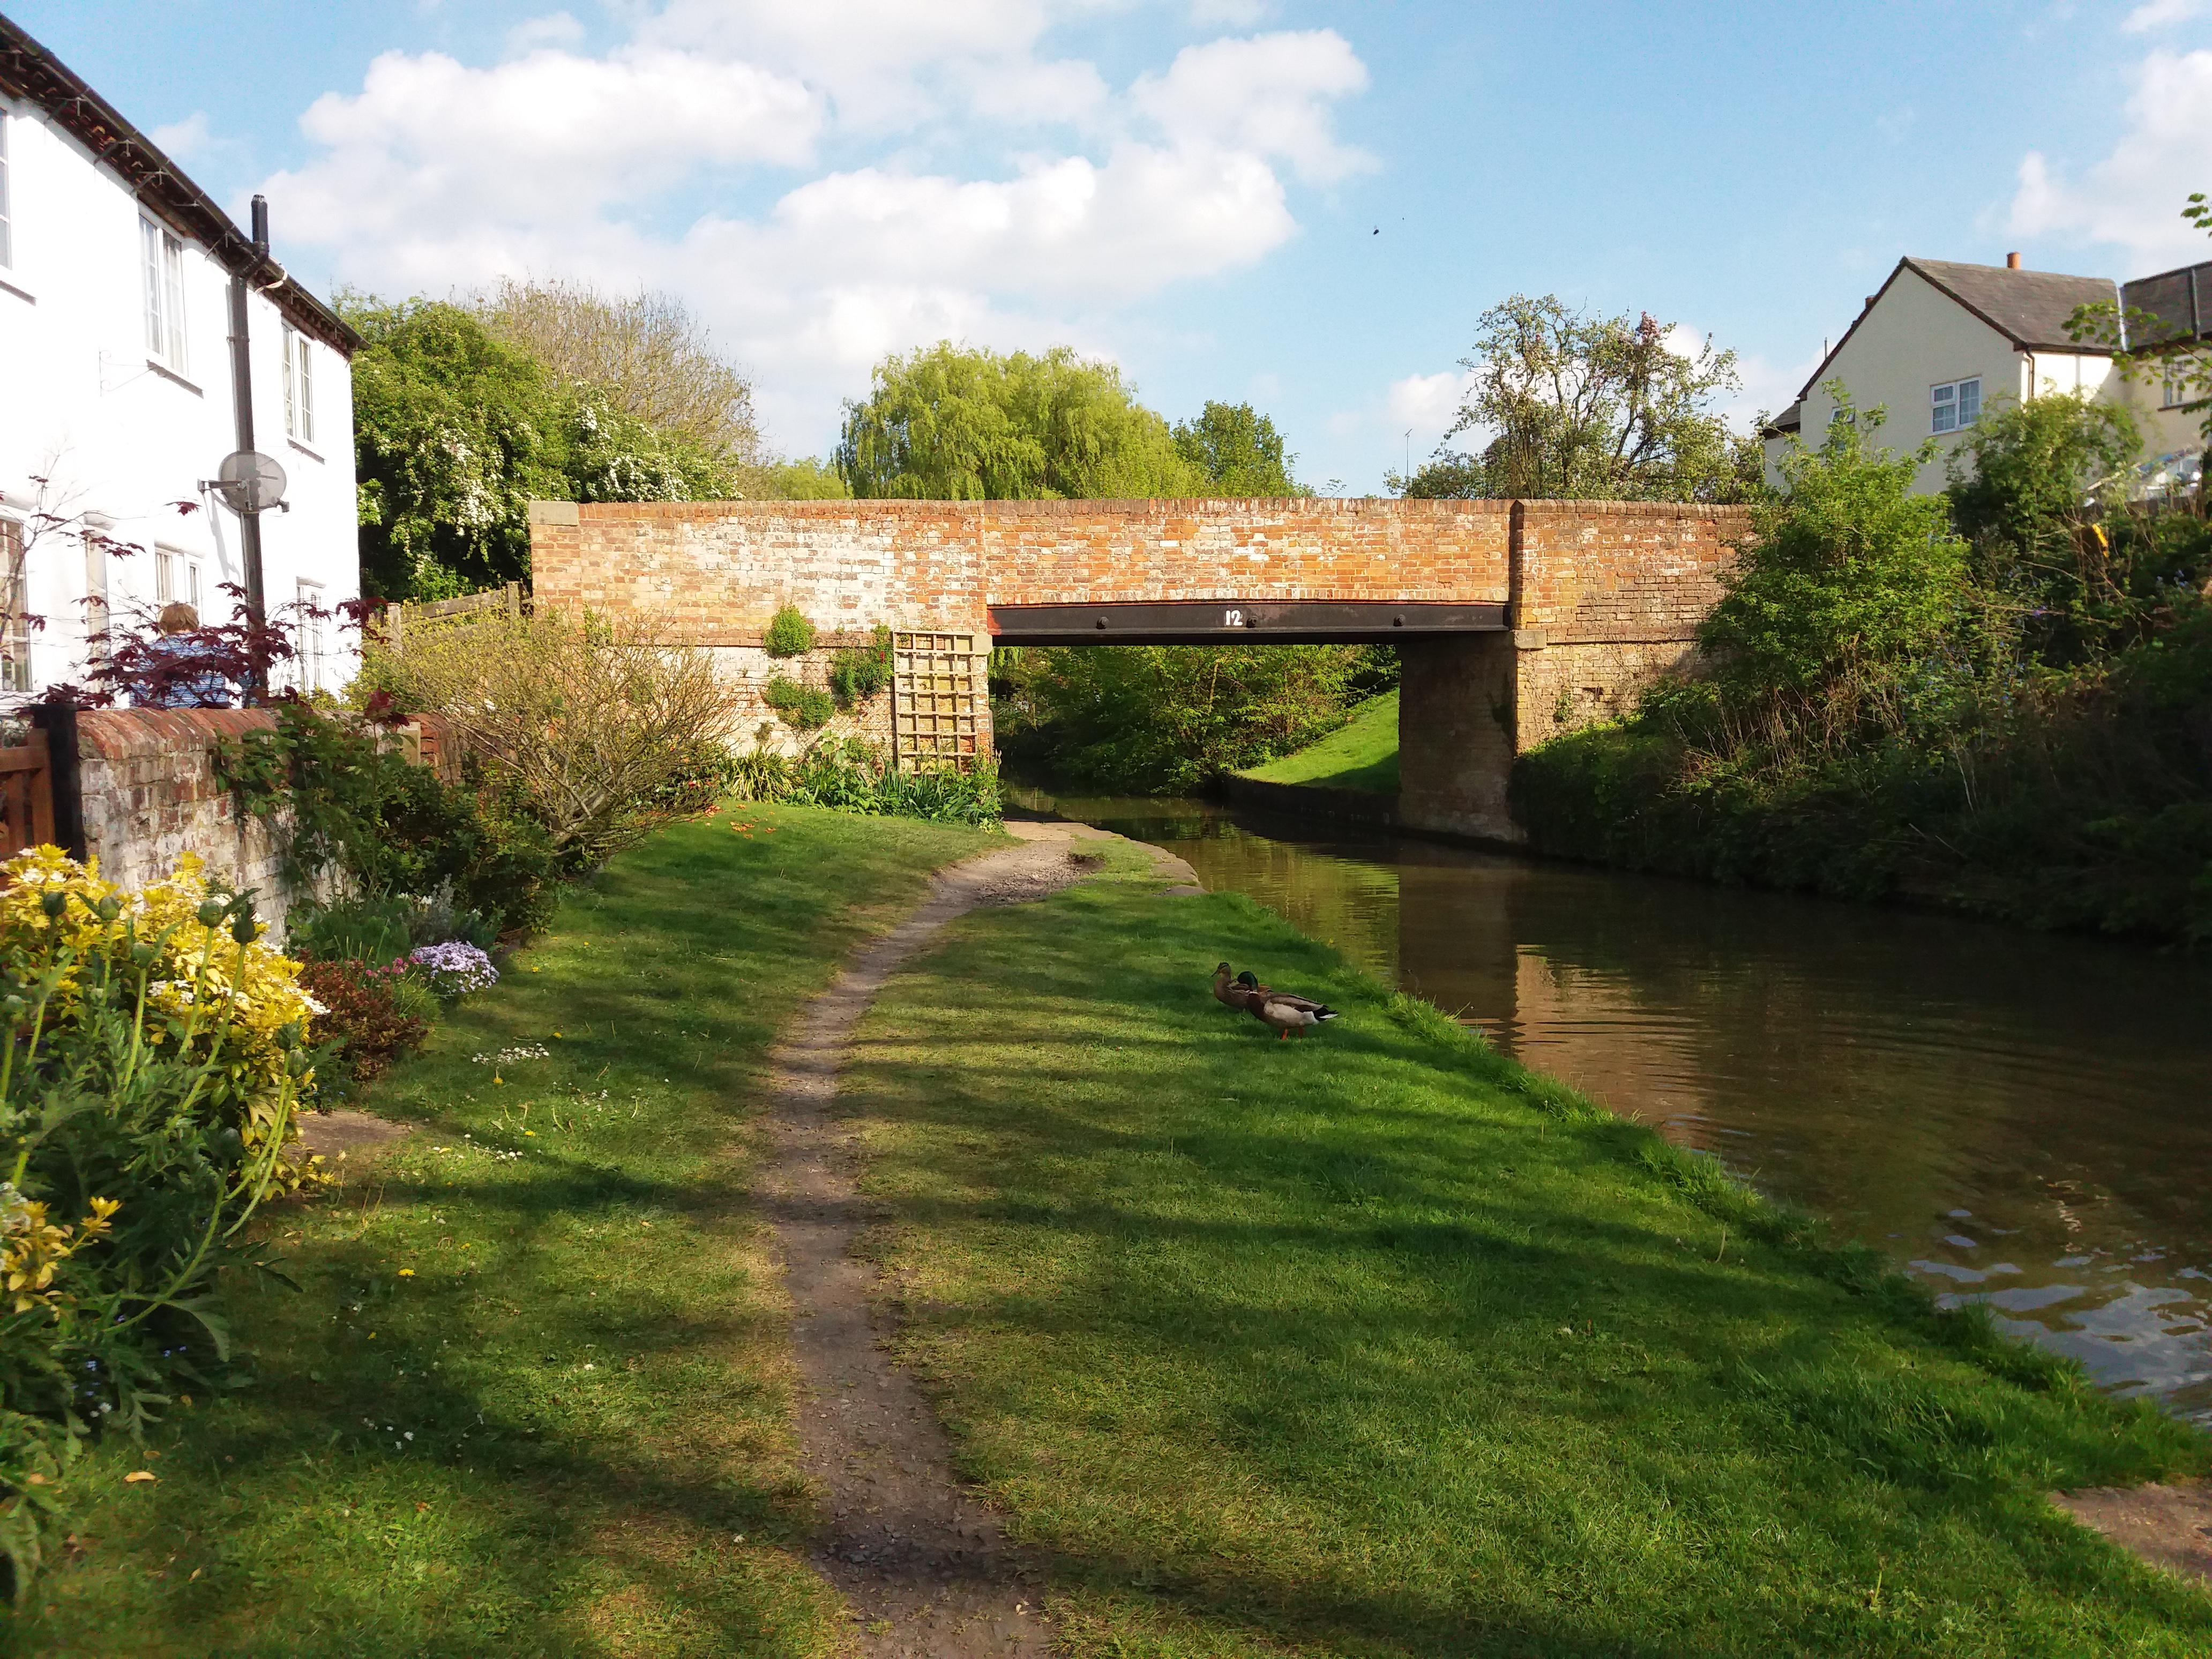 Canalside, Watford, Northamptonshire